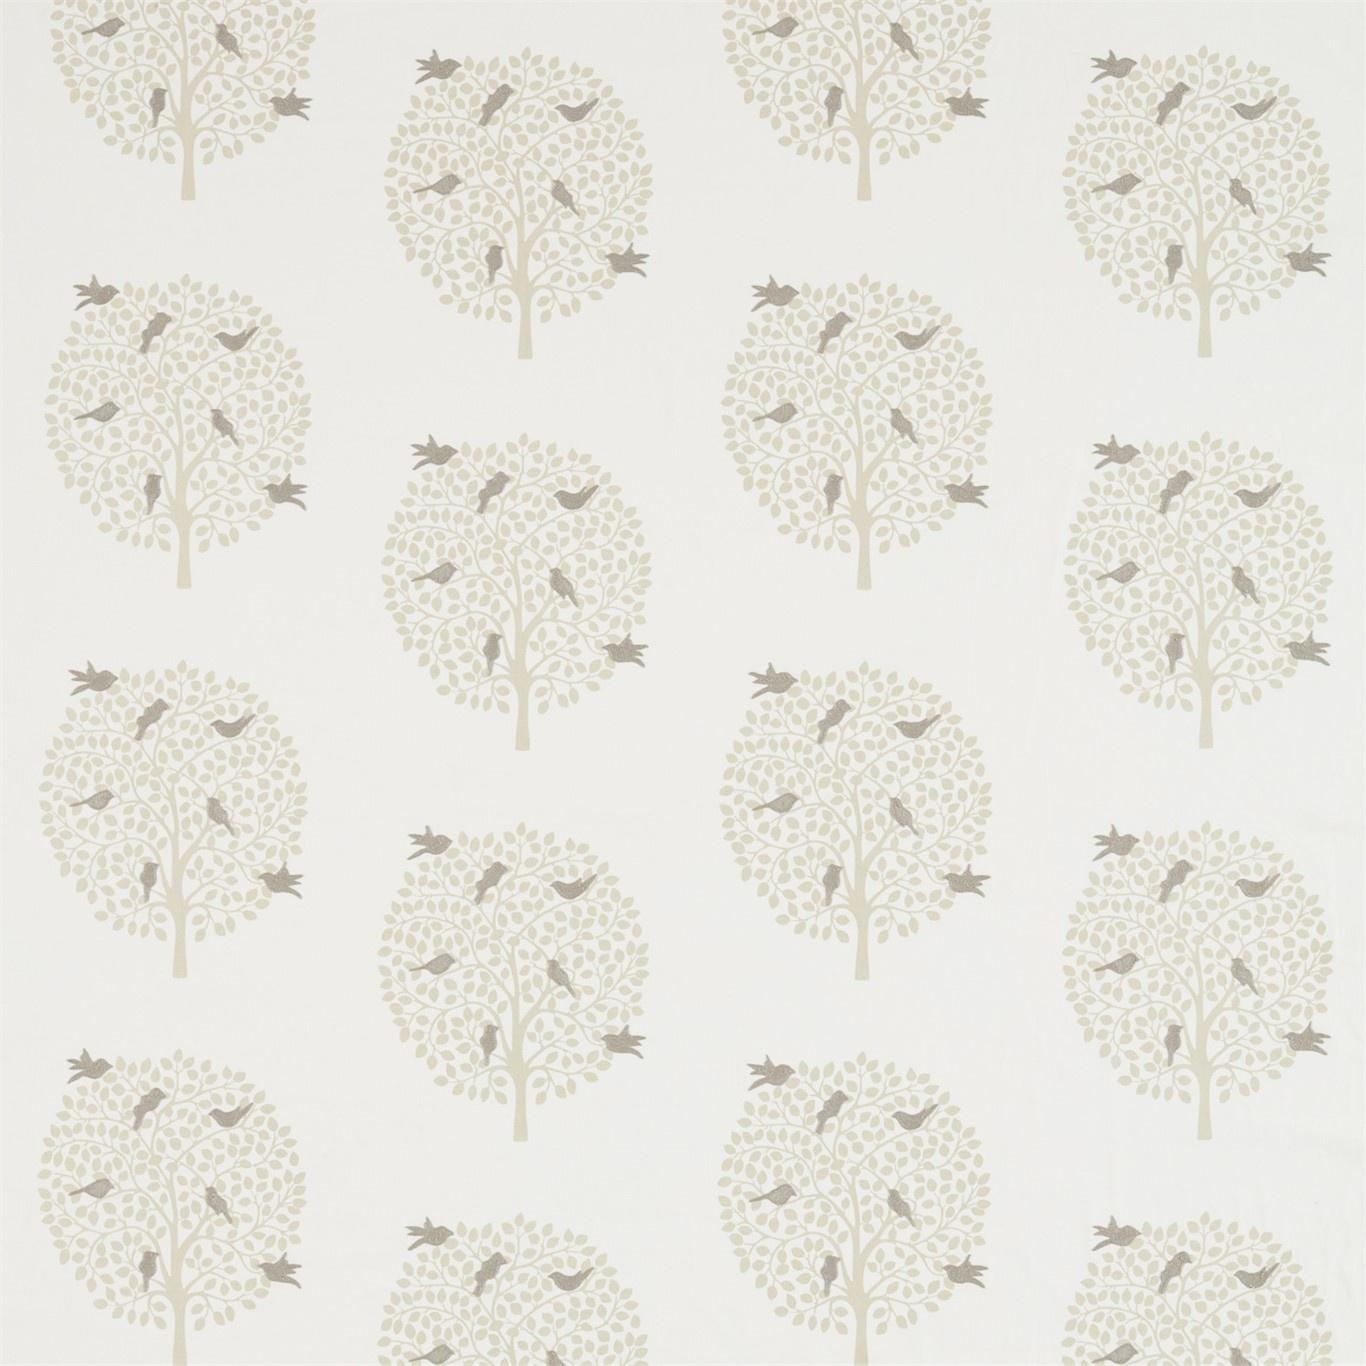 Image of Sanderson Home Bay Tree Mole Fabric 236430